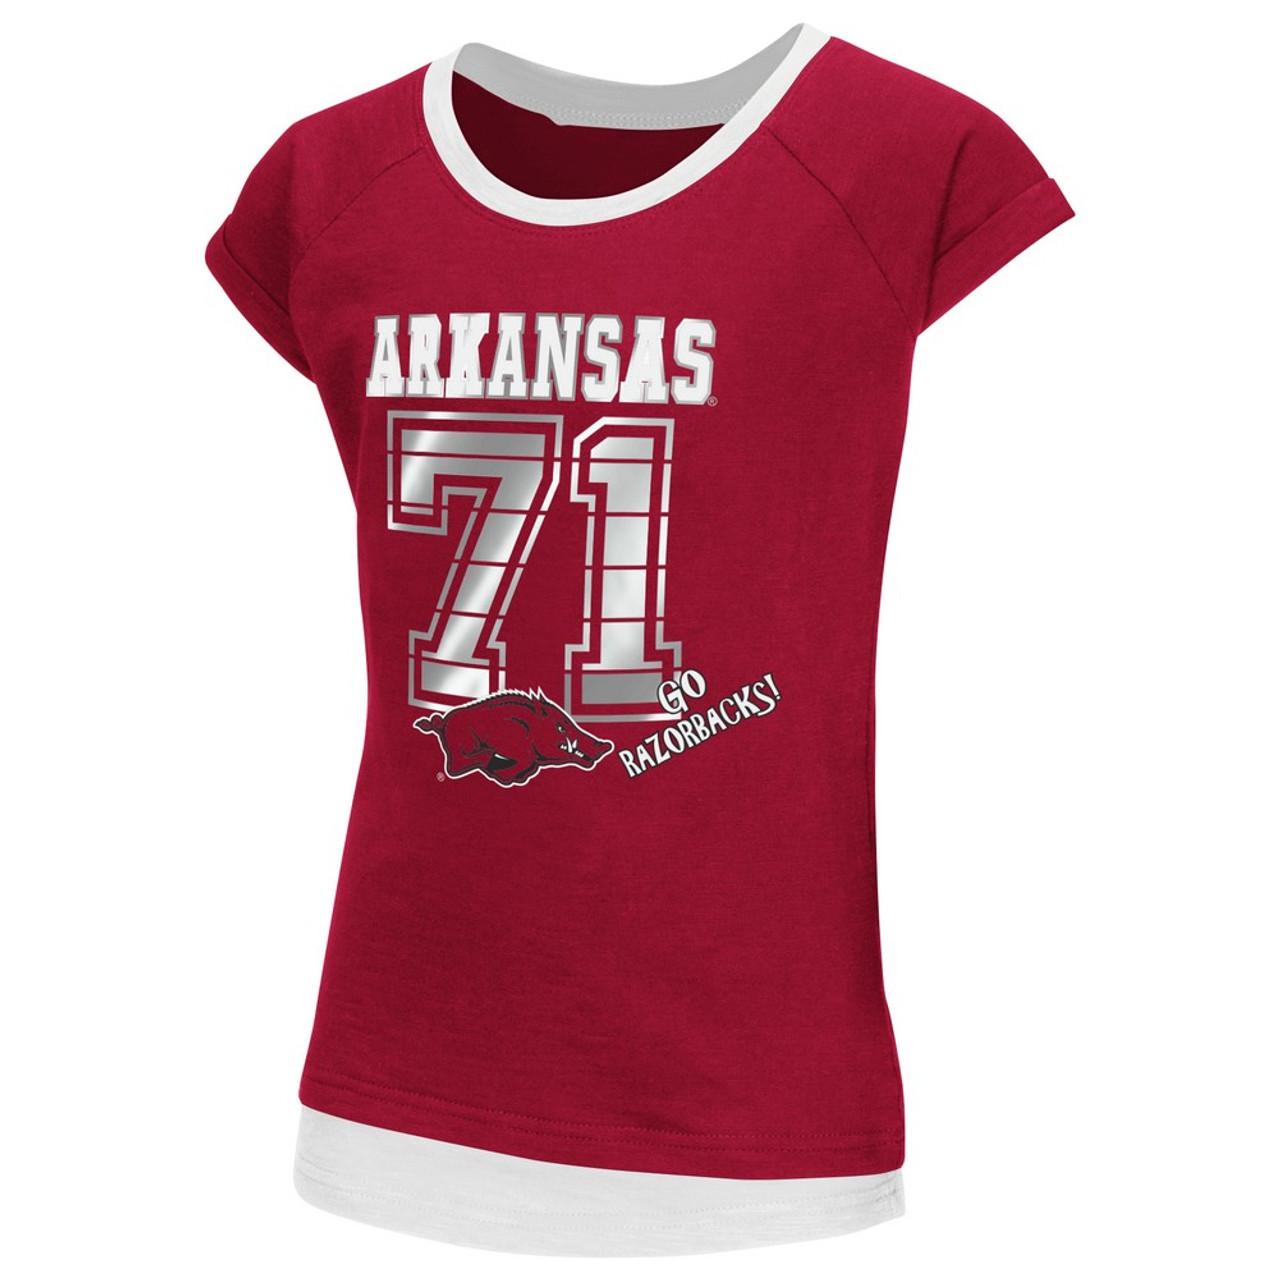 Arkansas Razorback Youth Girls Roll Sleeve Tee